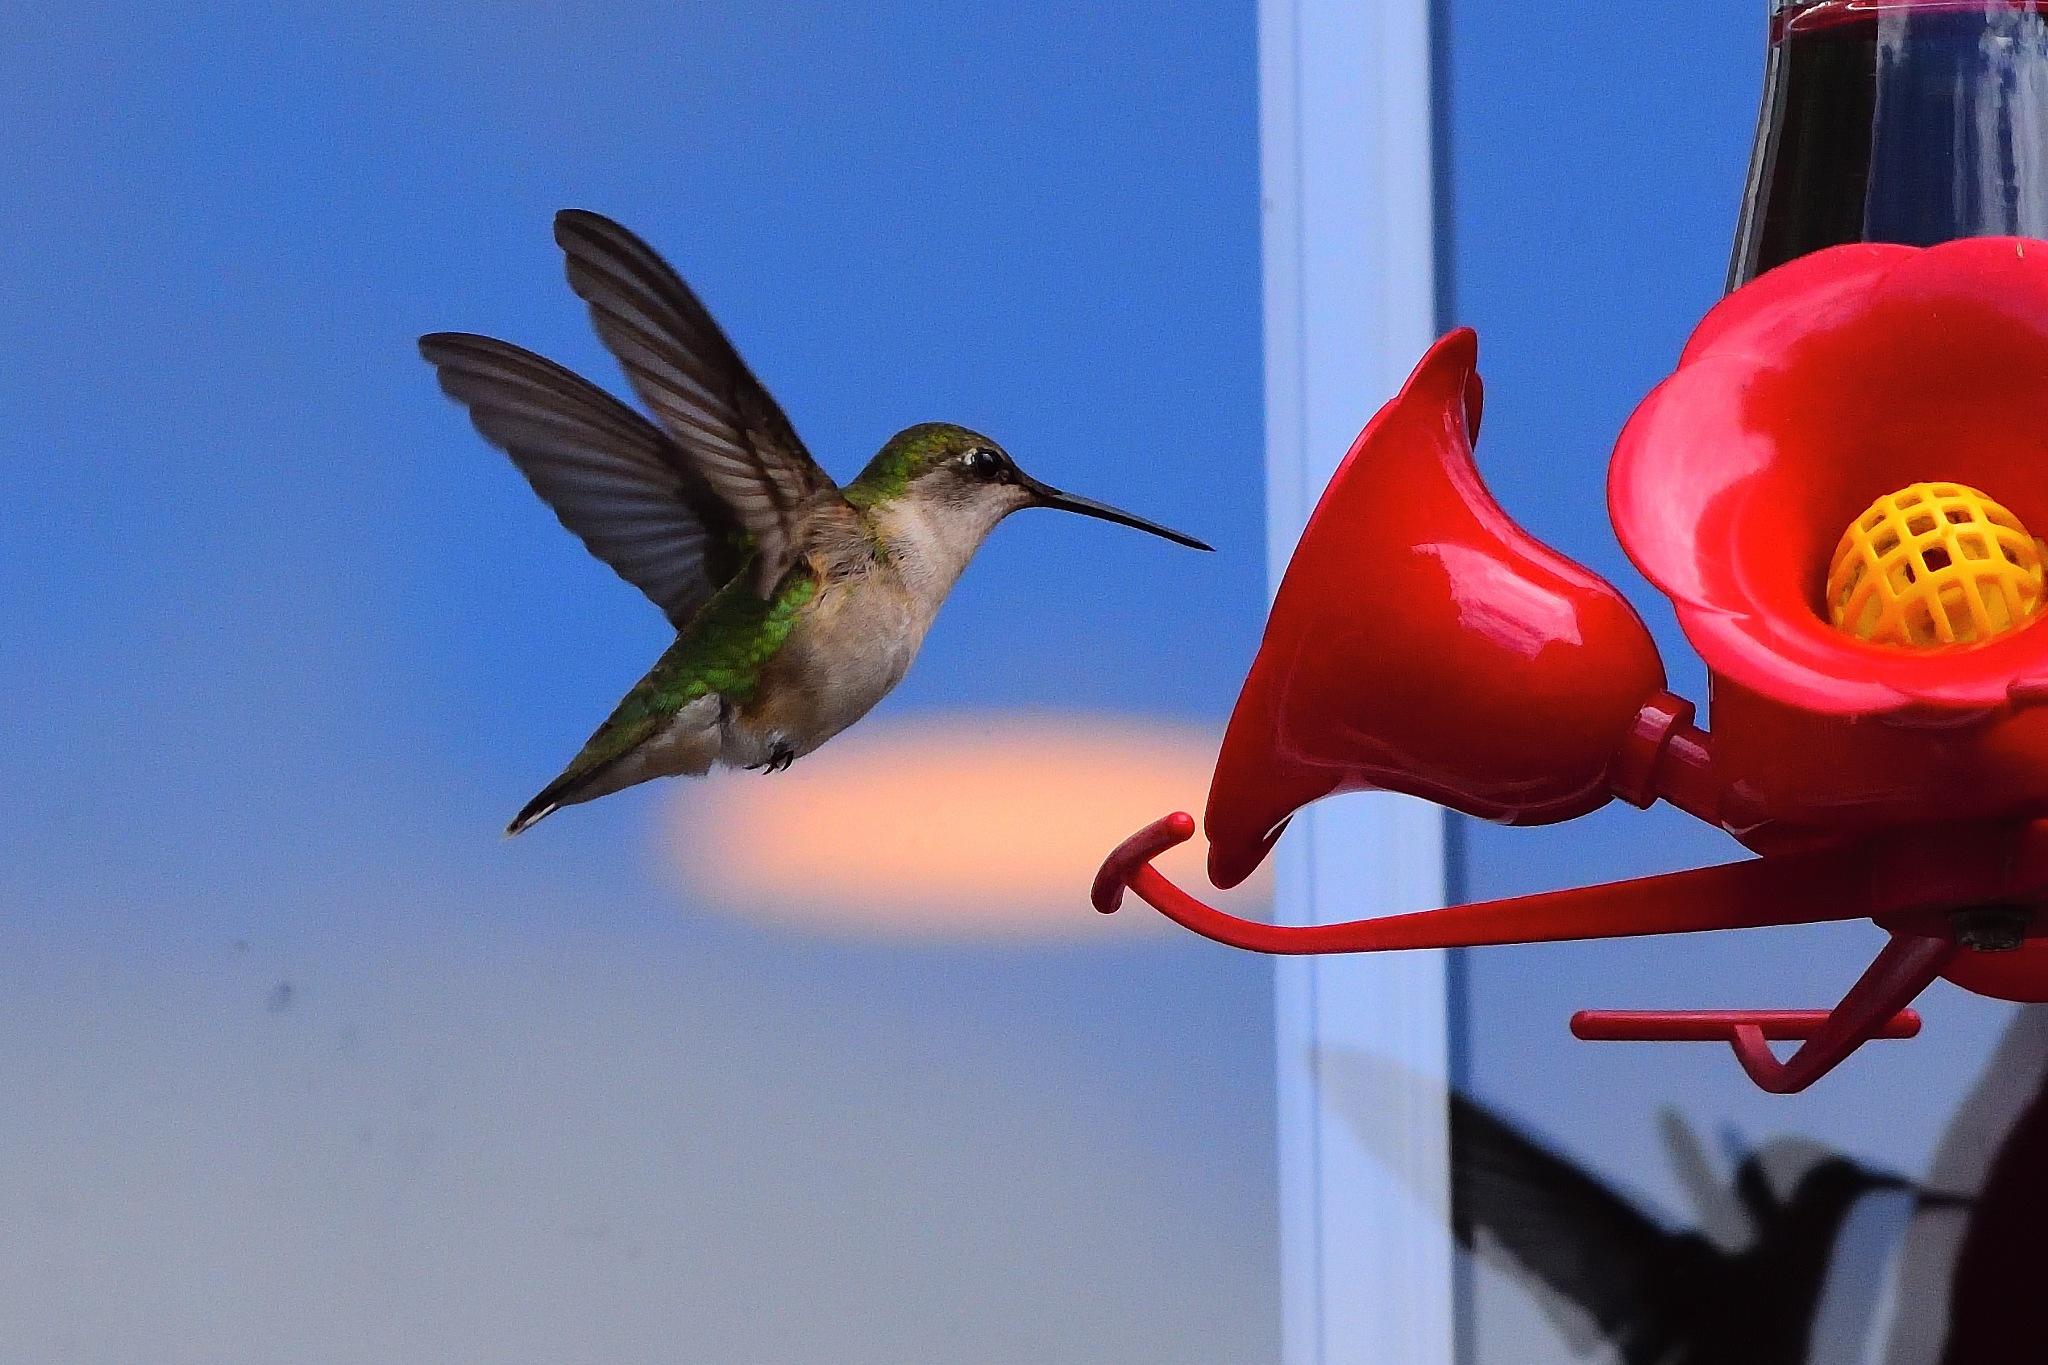 Hummingbird #3 by Greg Knott